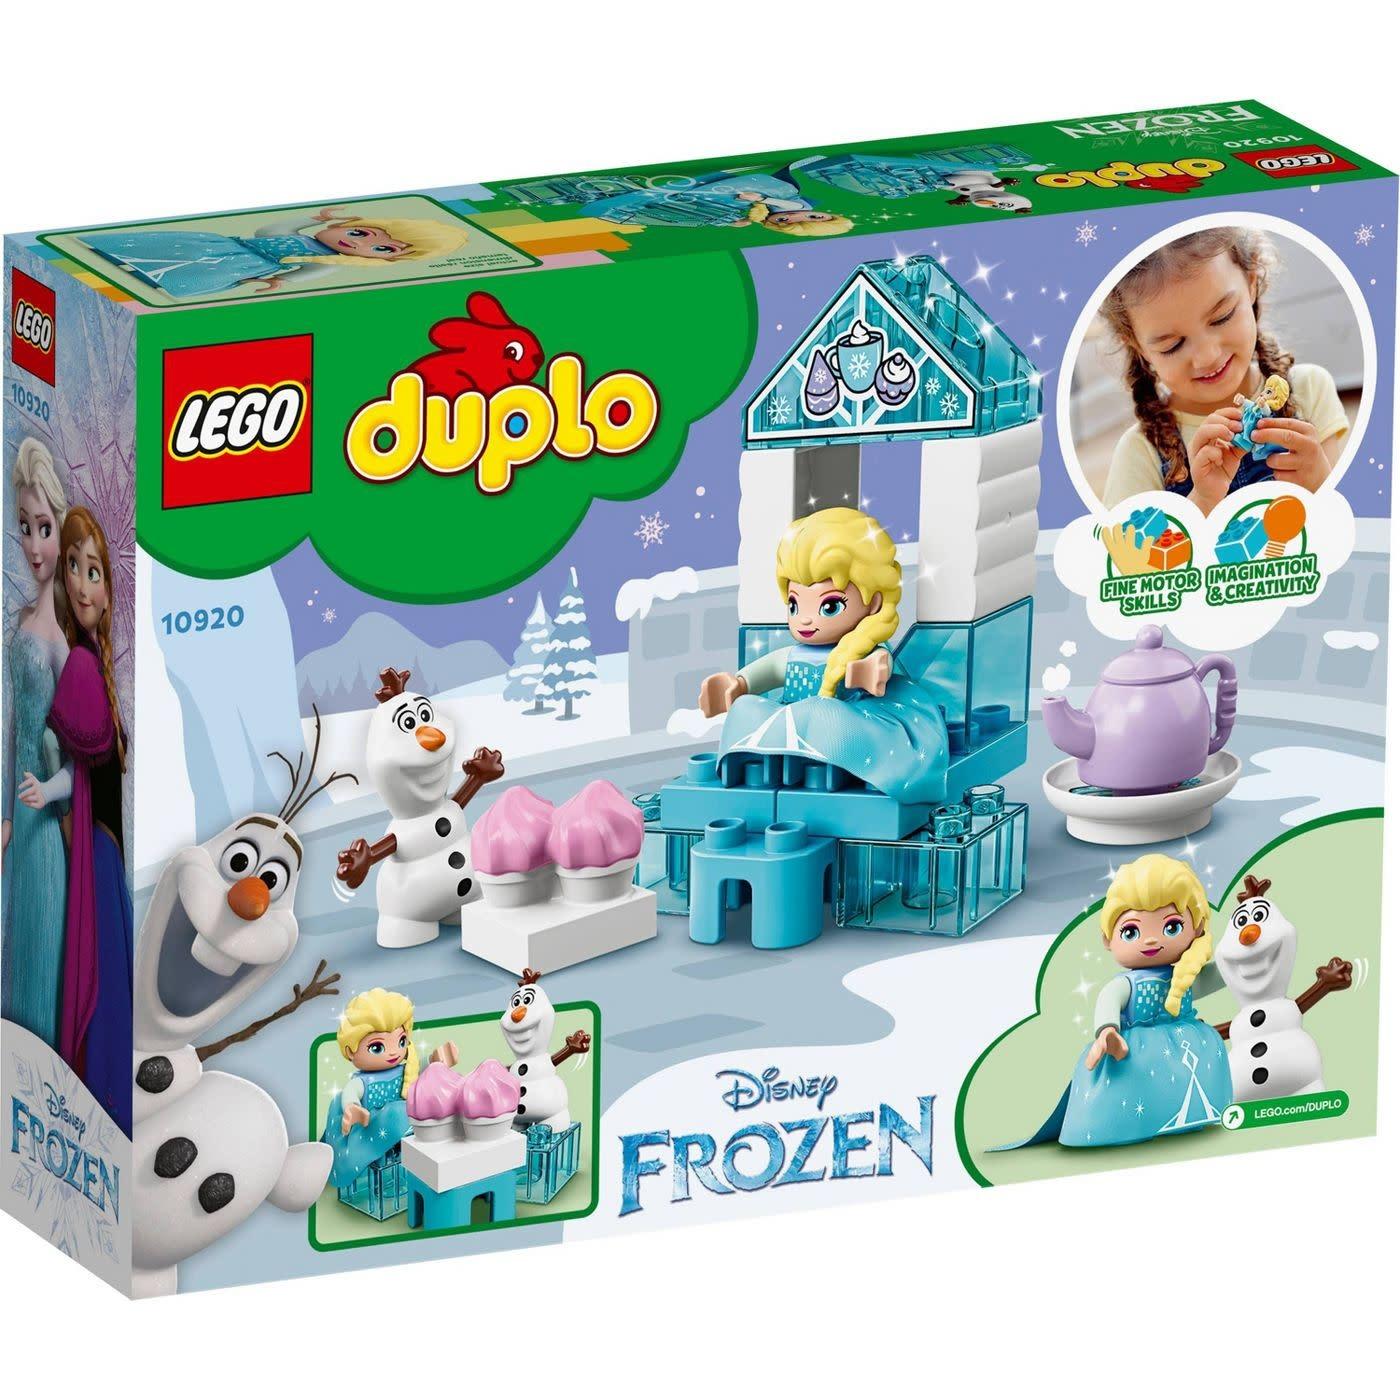 10920 Elsa & Olaf's Tea Party by LEGO